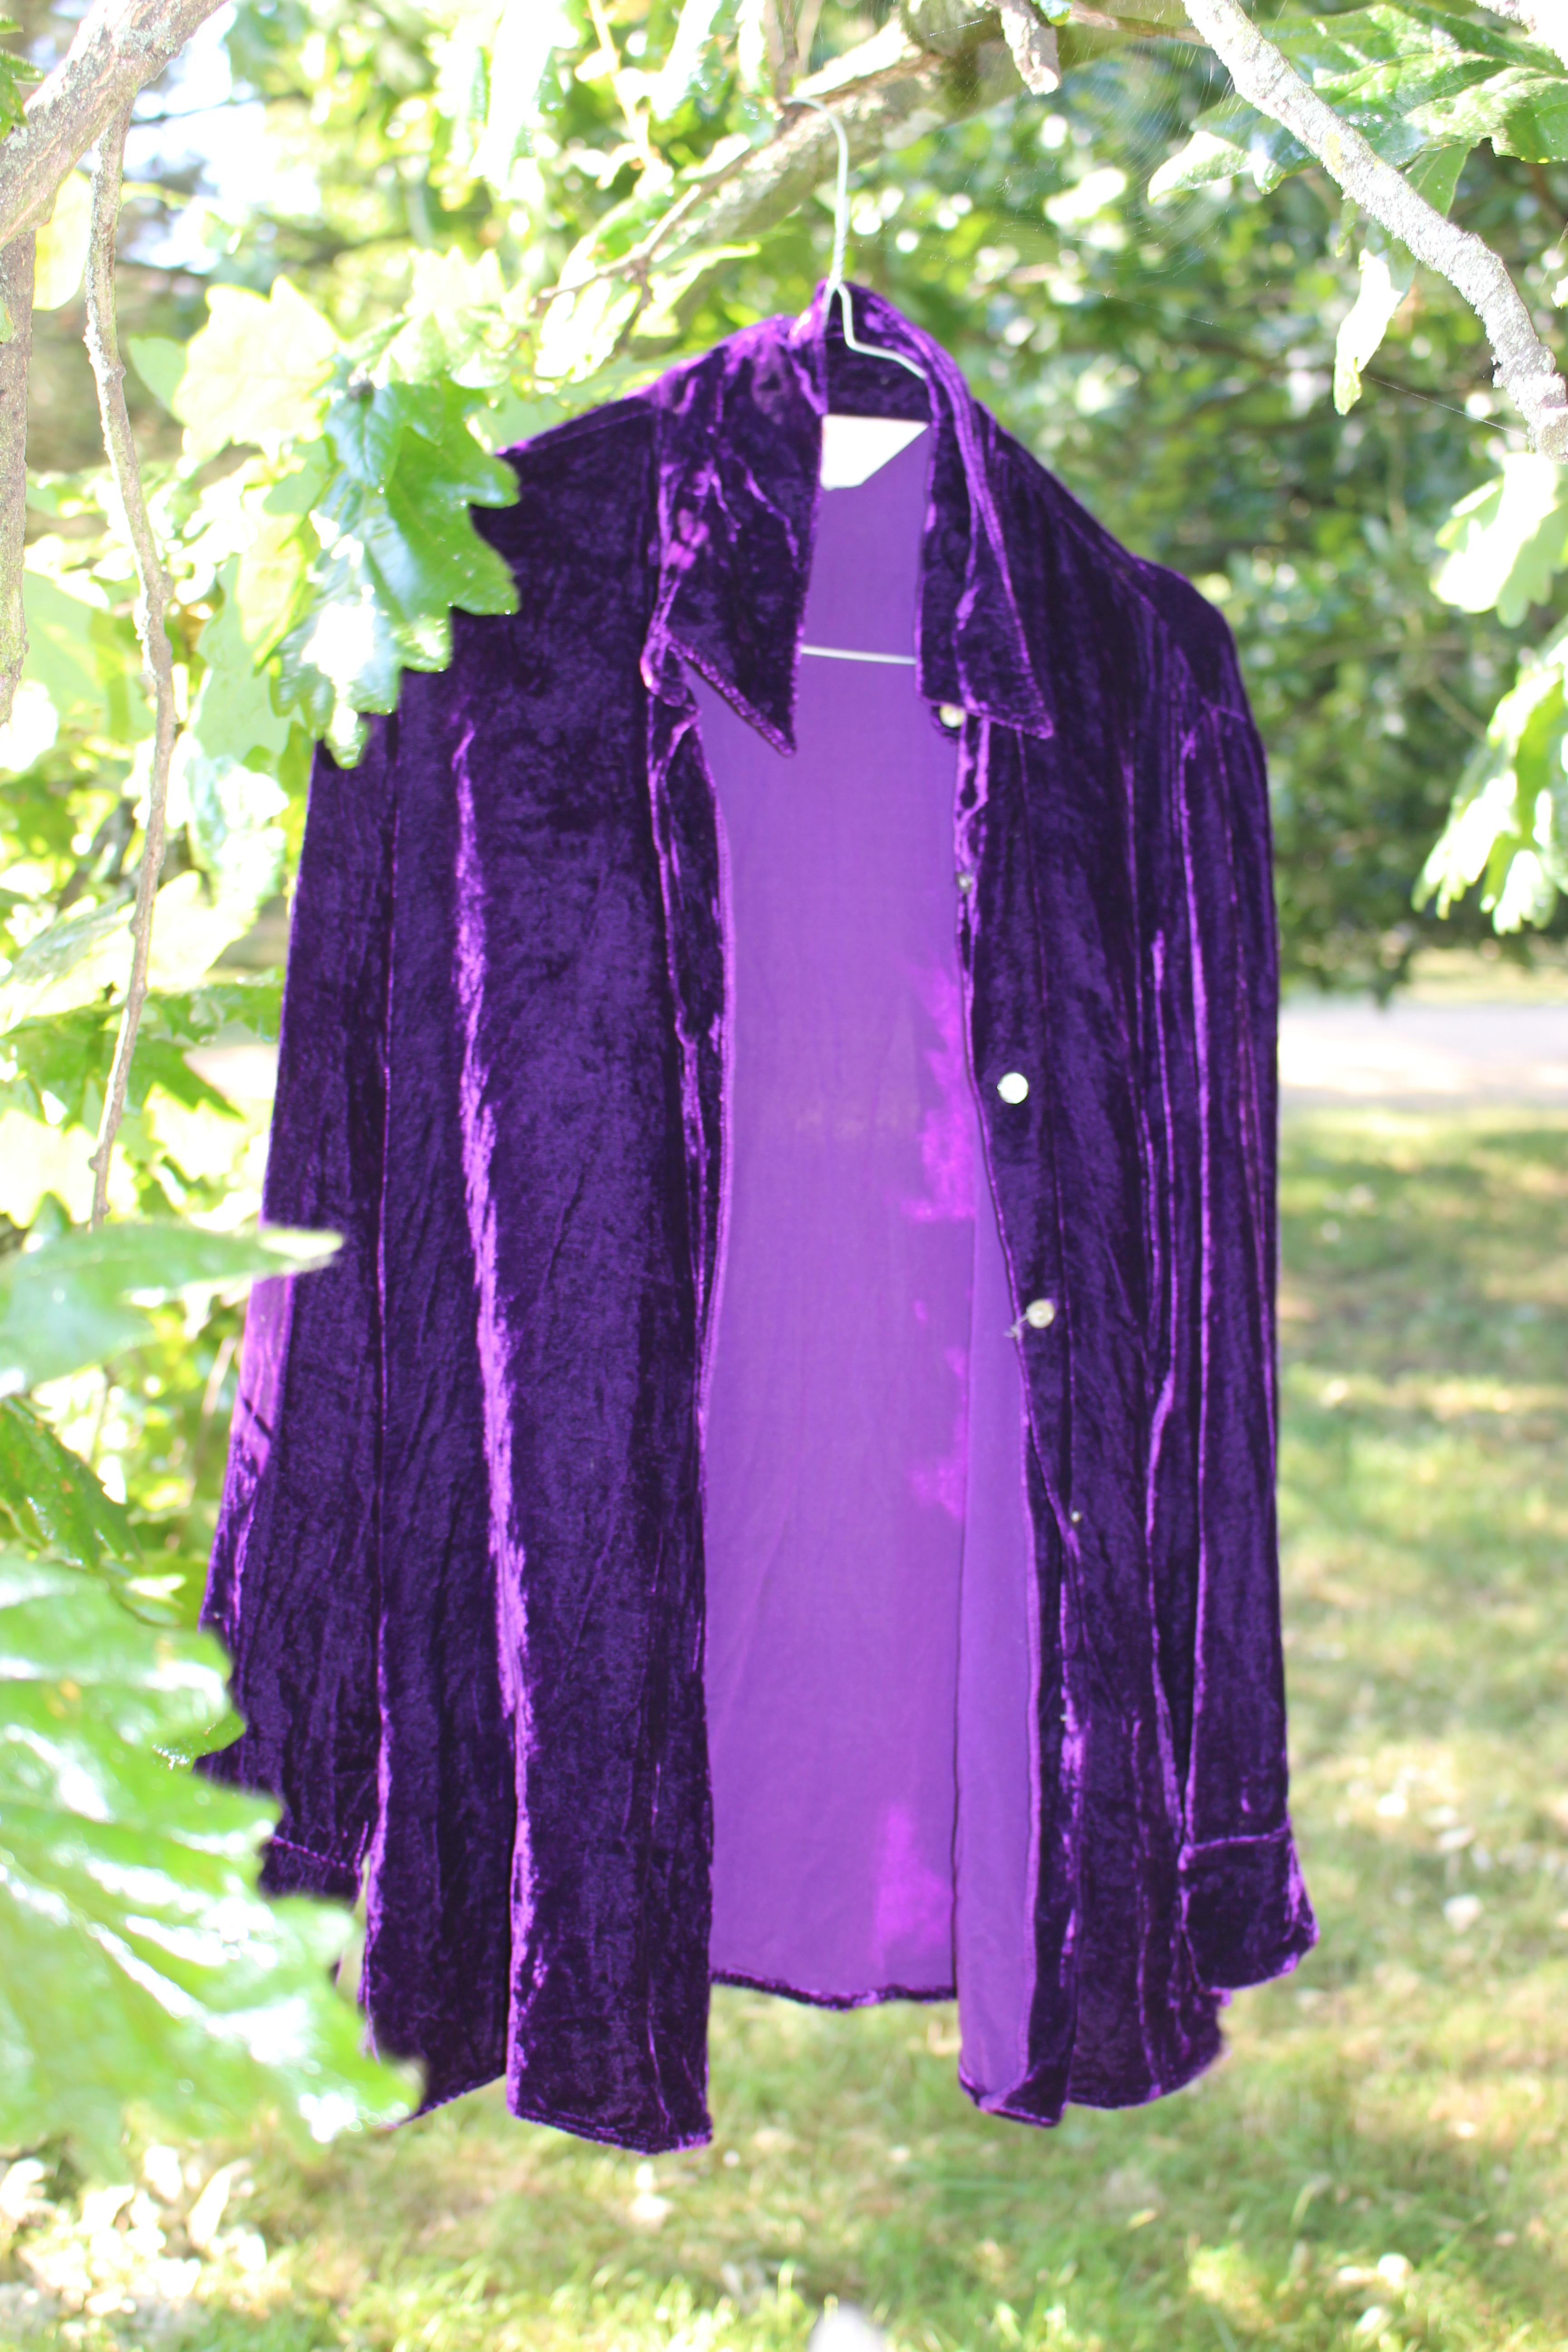 Art of Silk purple velvet top, from Unicorn, 5 Ship Street, Oxford